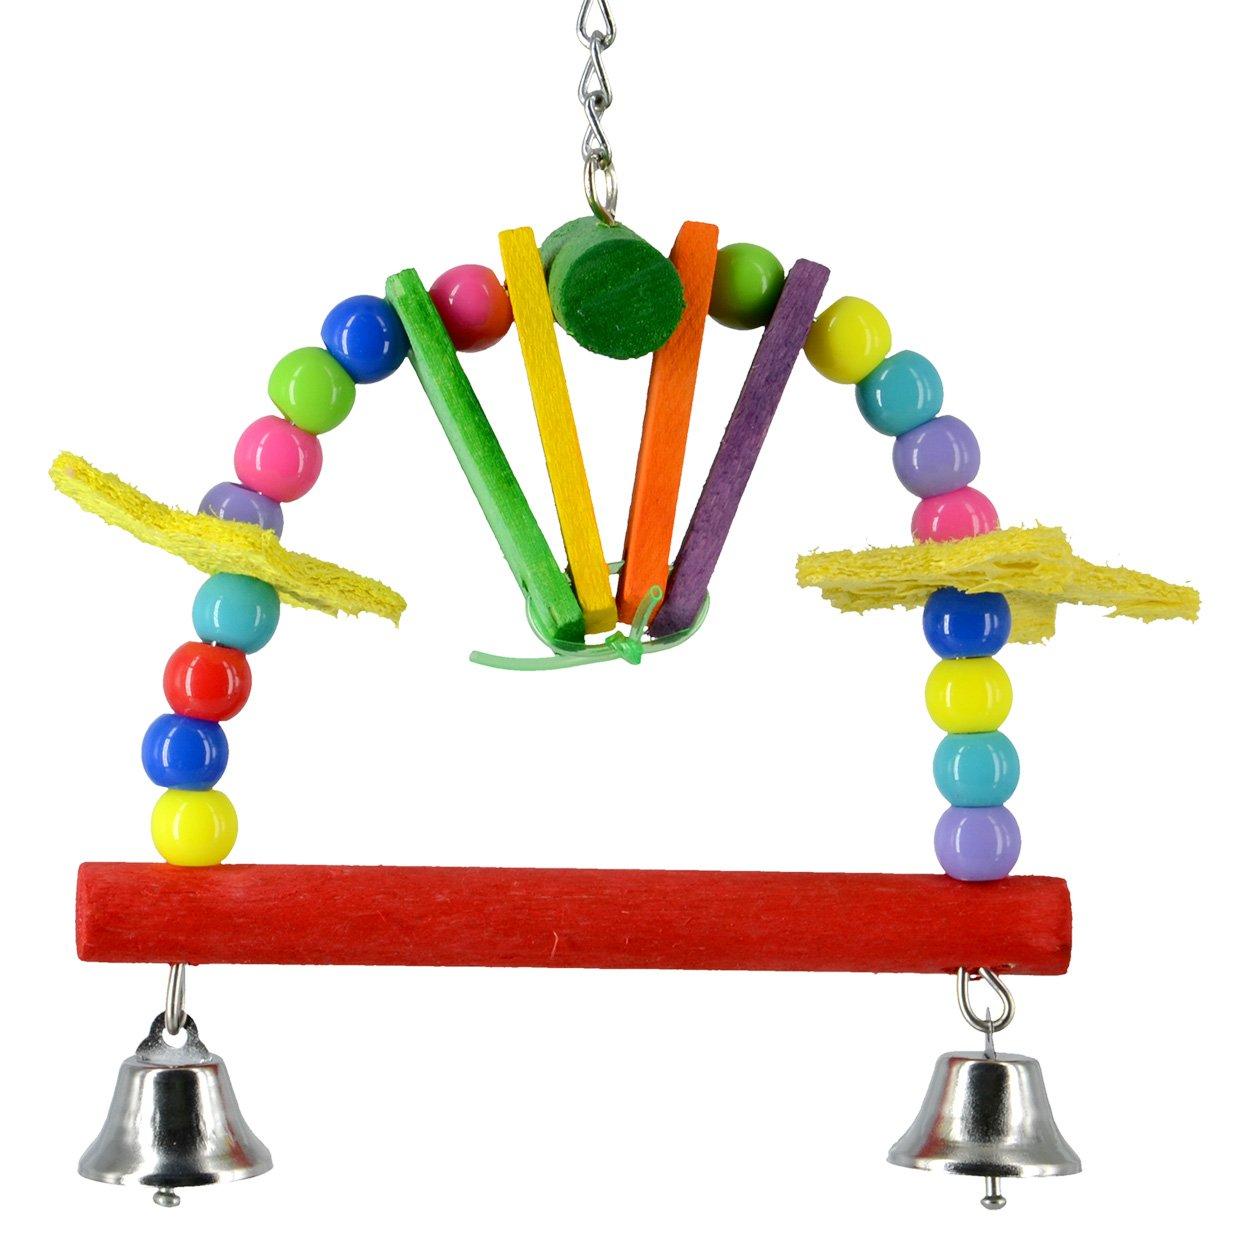 Animal Treasures LBW-0192 Birdie Jingle Rainbow Perch Bird Toys by Animal Treasures (Image #1)